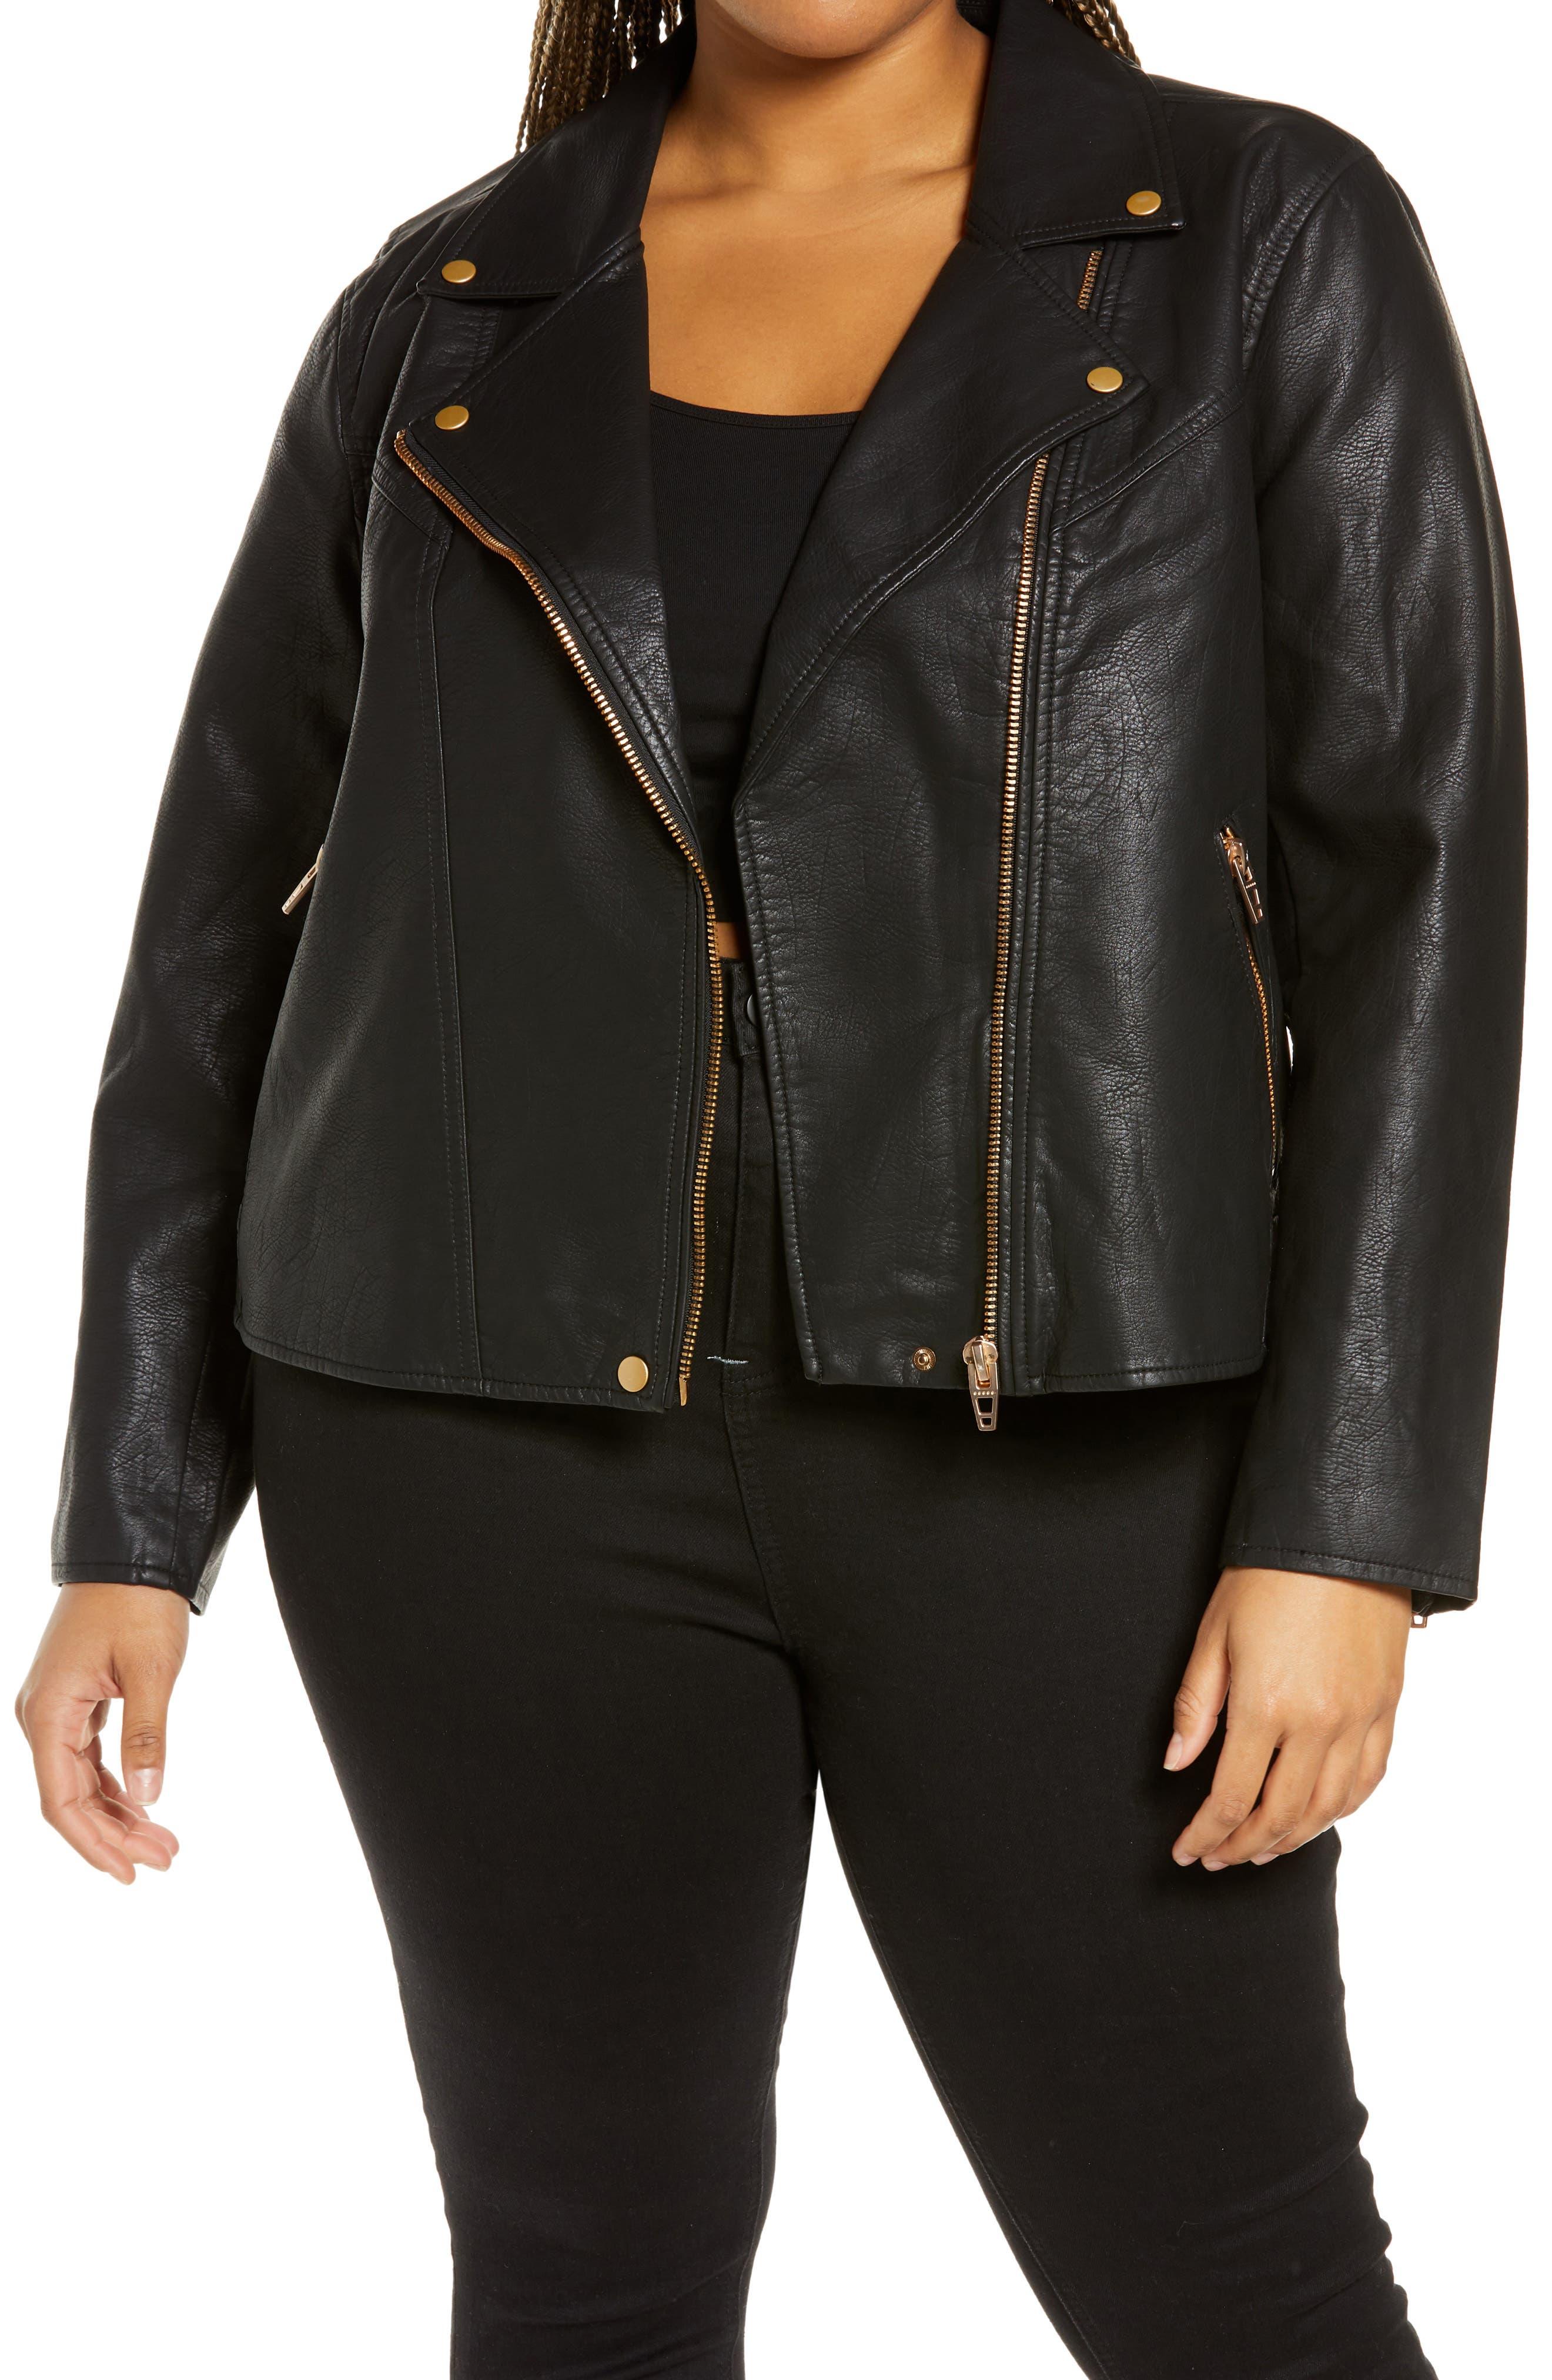 Plus Size Women's Blanknyc Lifechanger Faux Leather Moto Jacket, Size 1X - Black